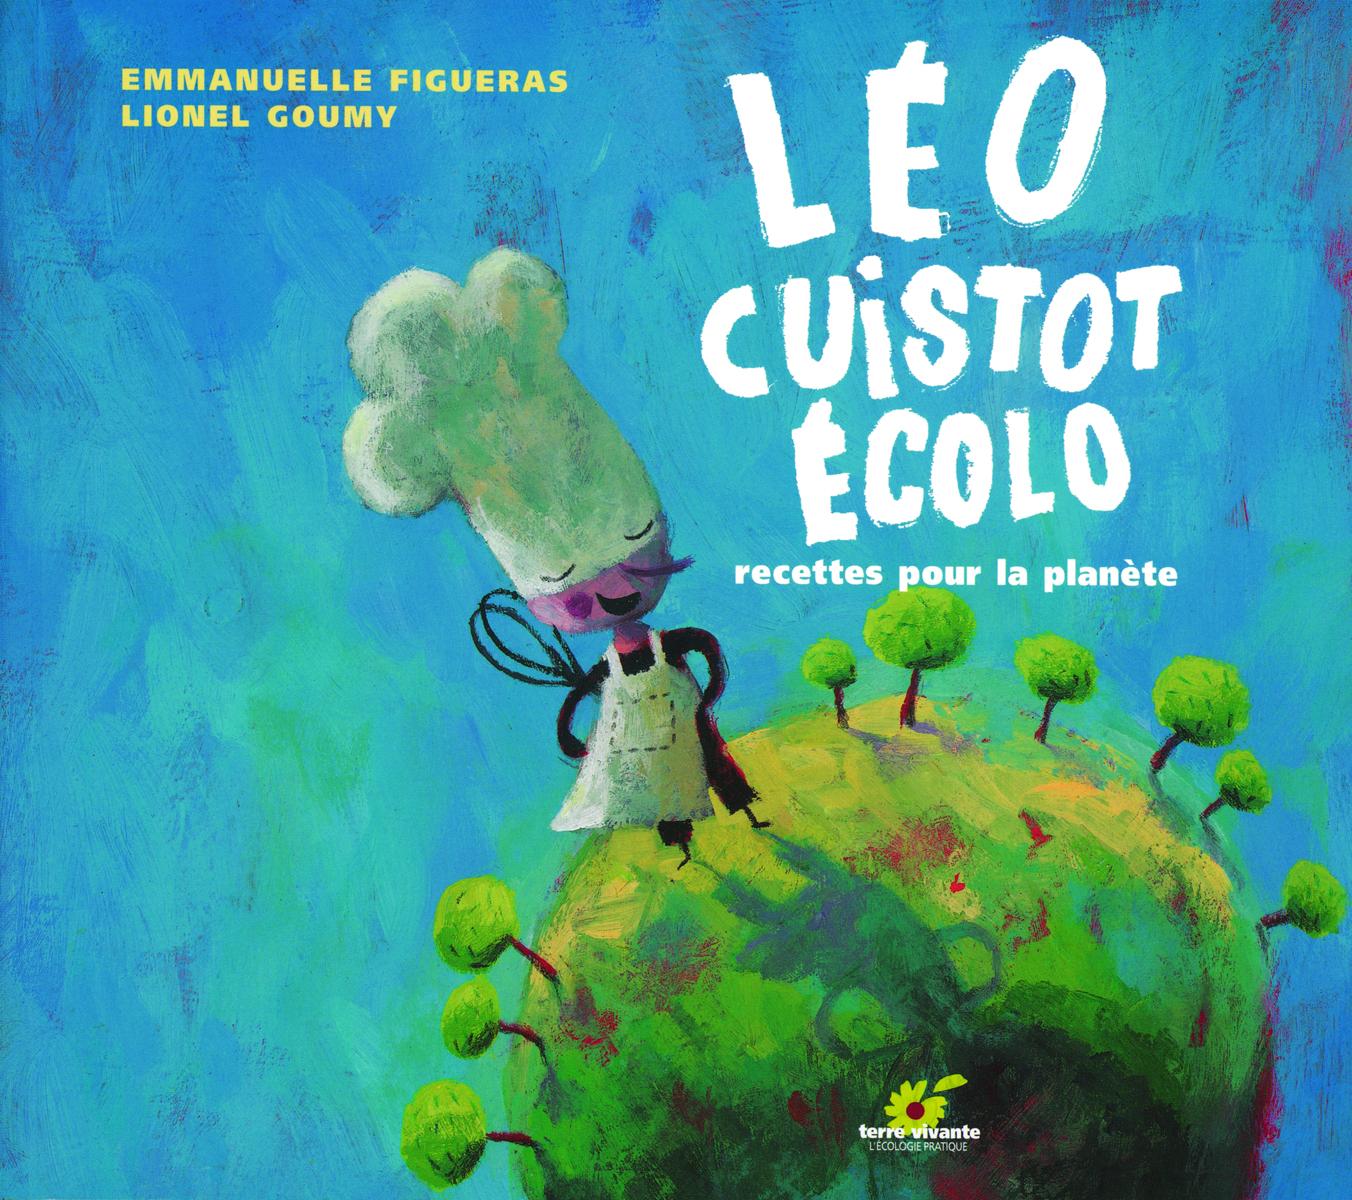 LEO CUISTOT ECOLO